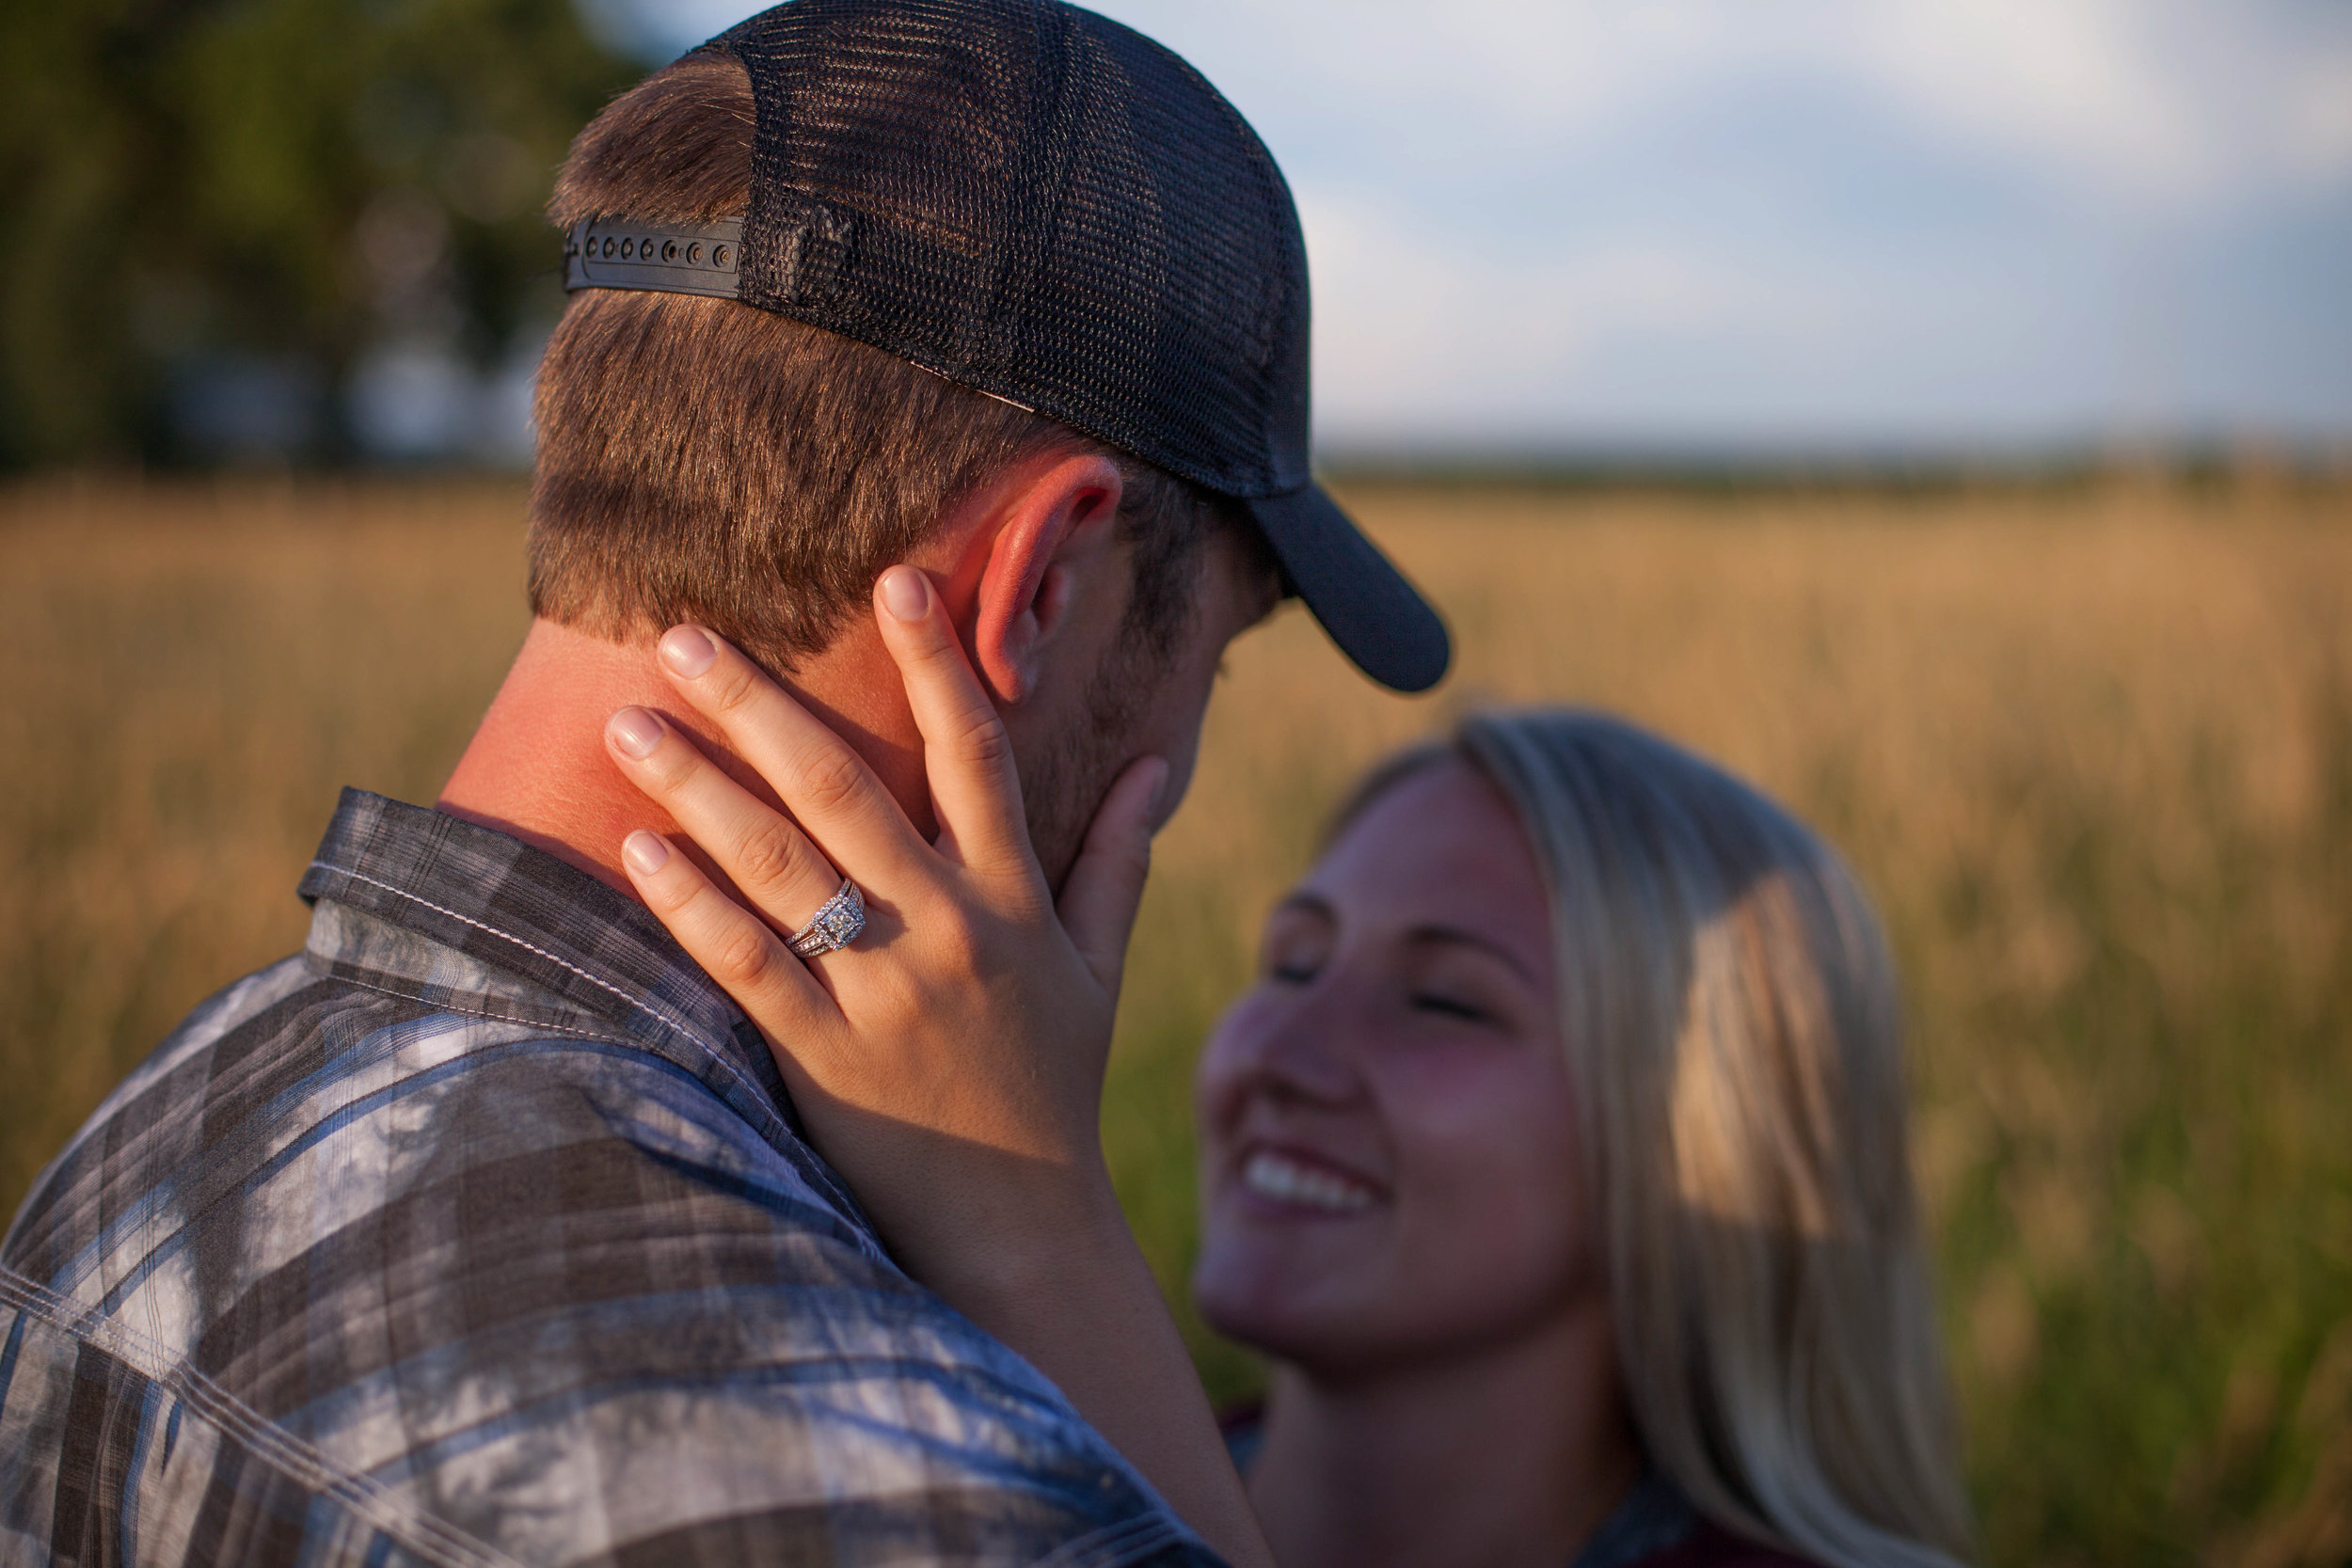 minnesota proposal engagement © kelilina photography 20170715145101.jpg